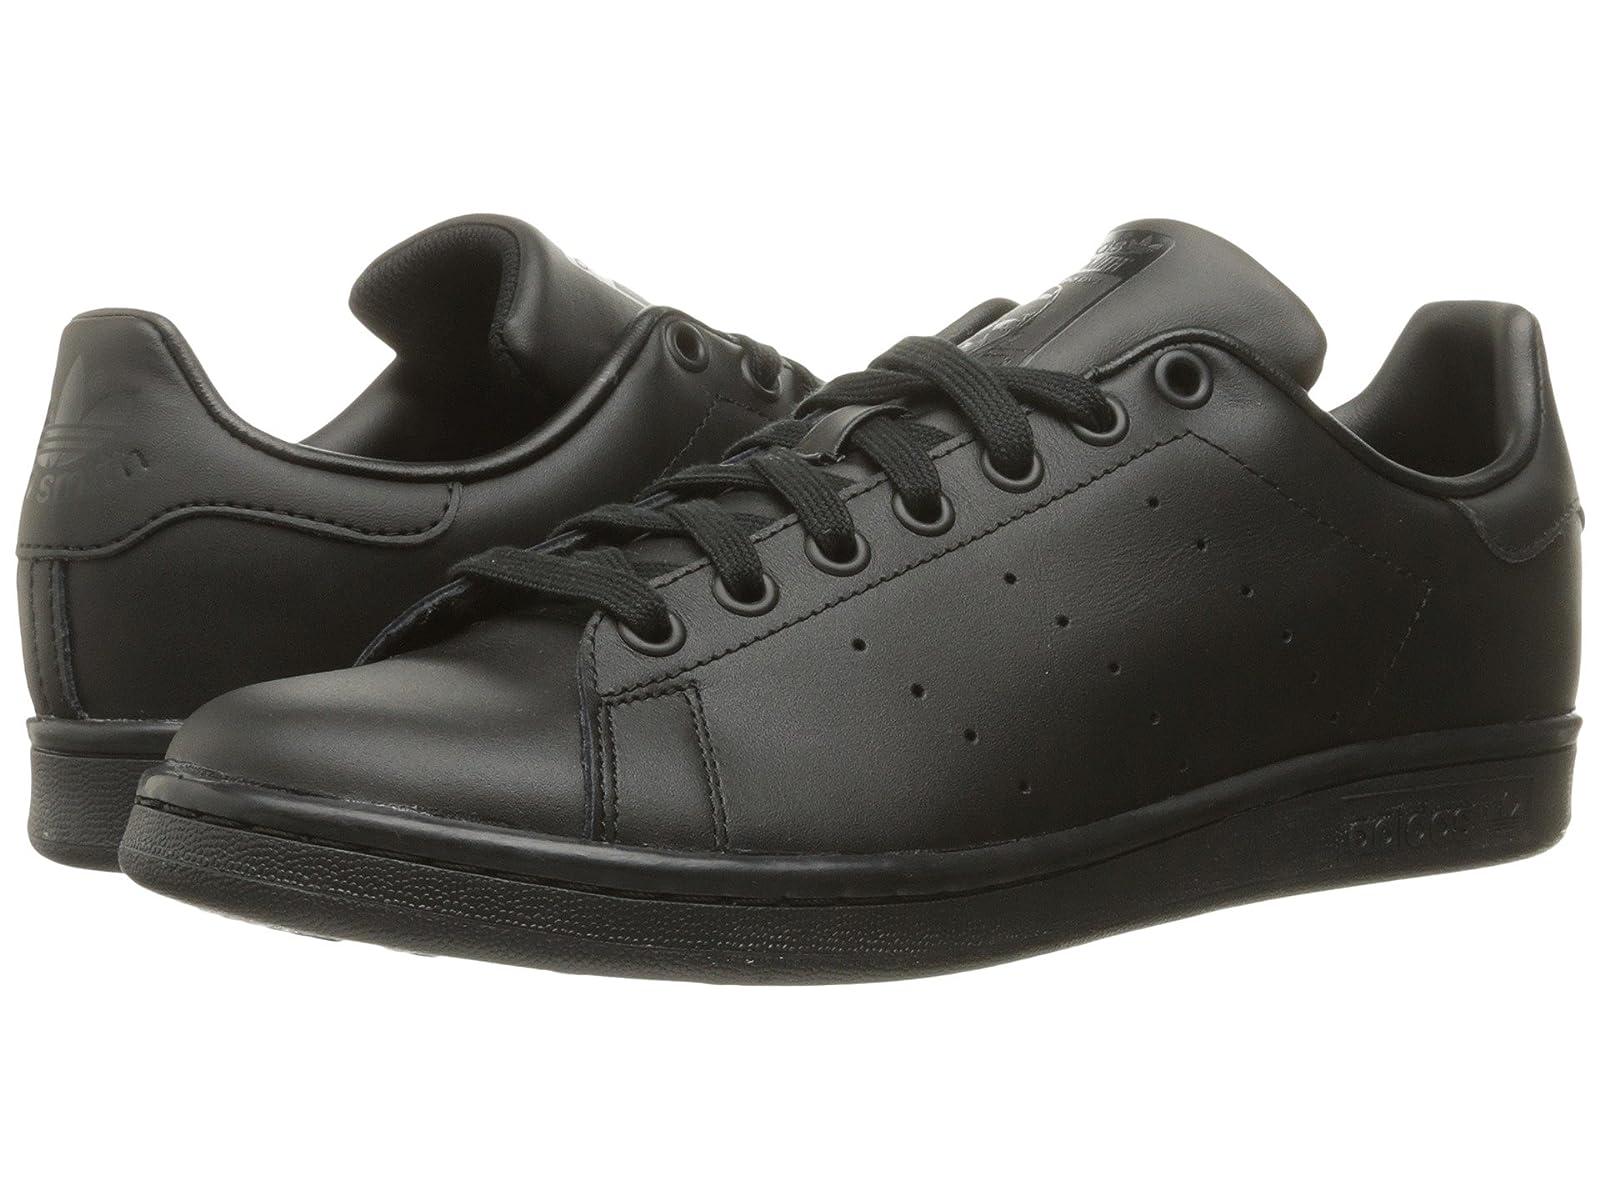 adidas Originals Stan SmithAtmospheric grades have affordable shoes